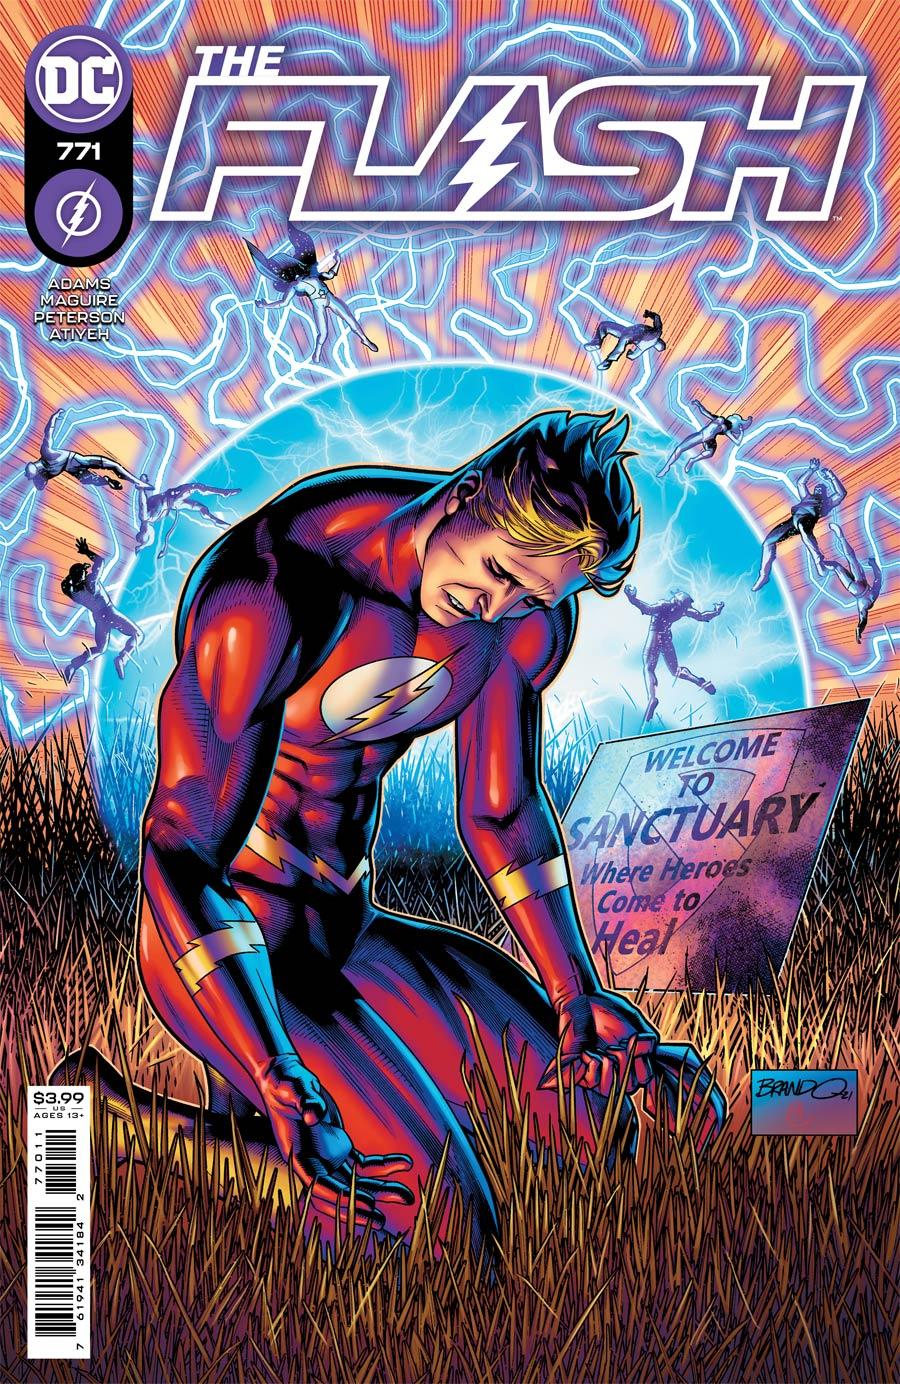 Flash Vol 5 #771 Cover A Regular Brandon Peterson Cover